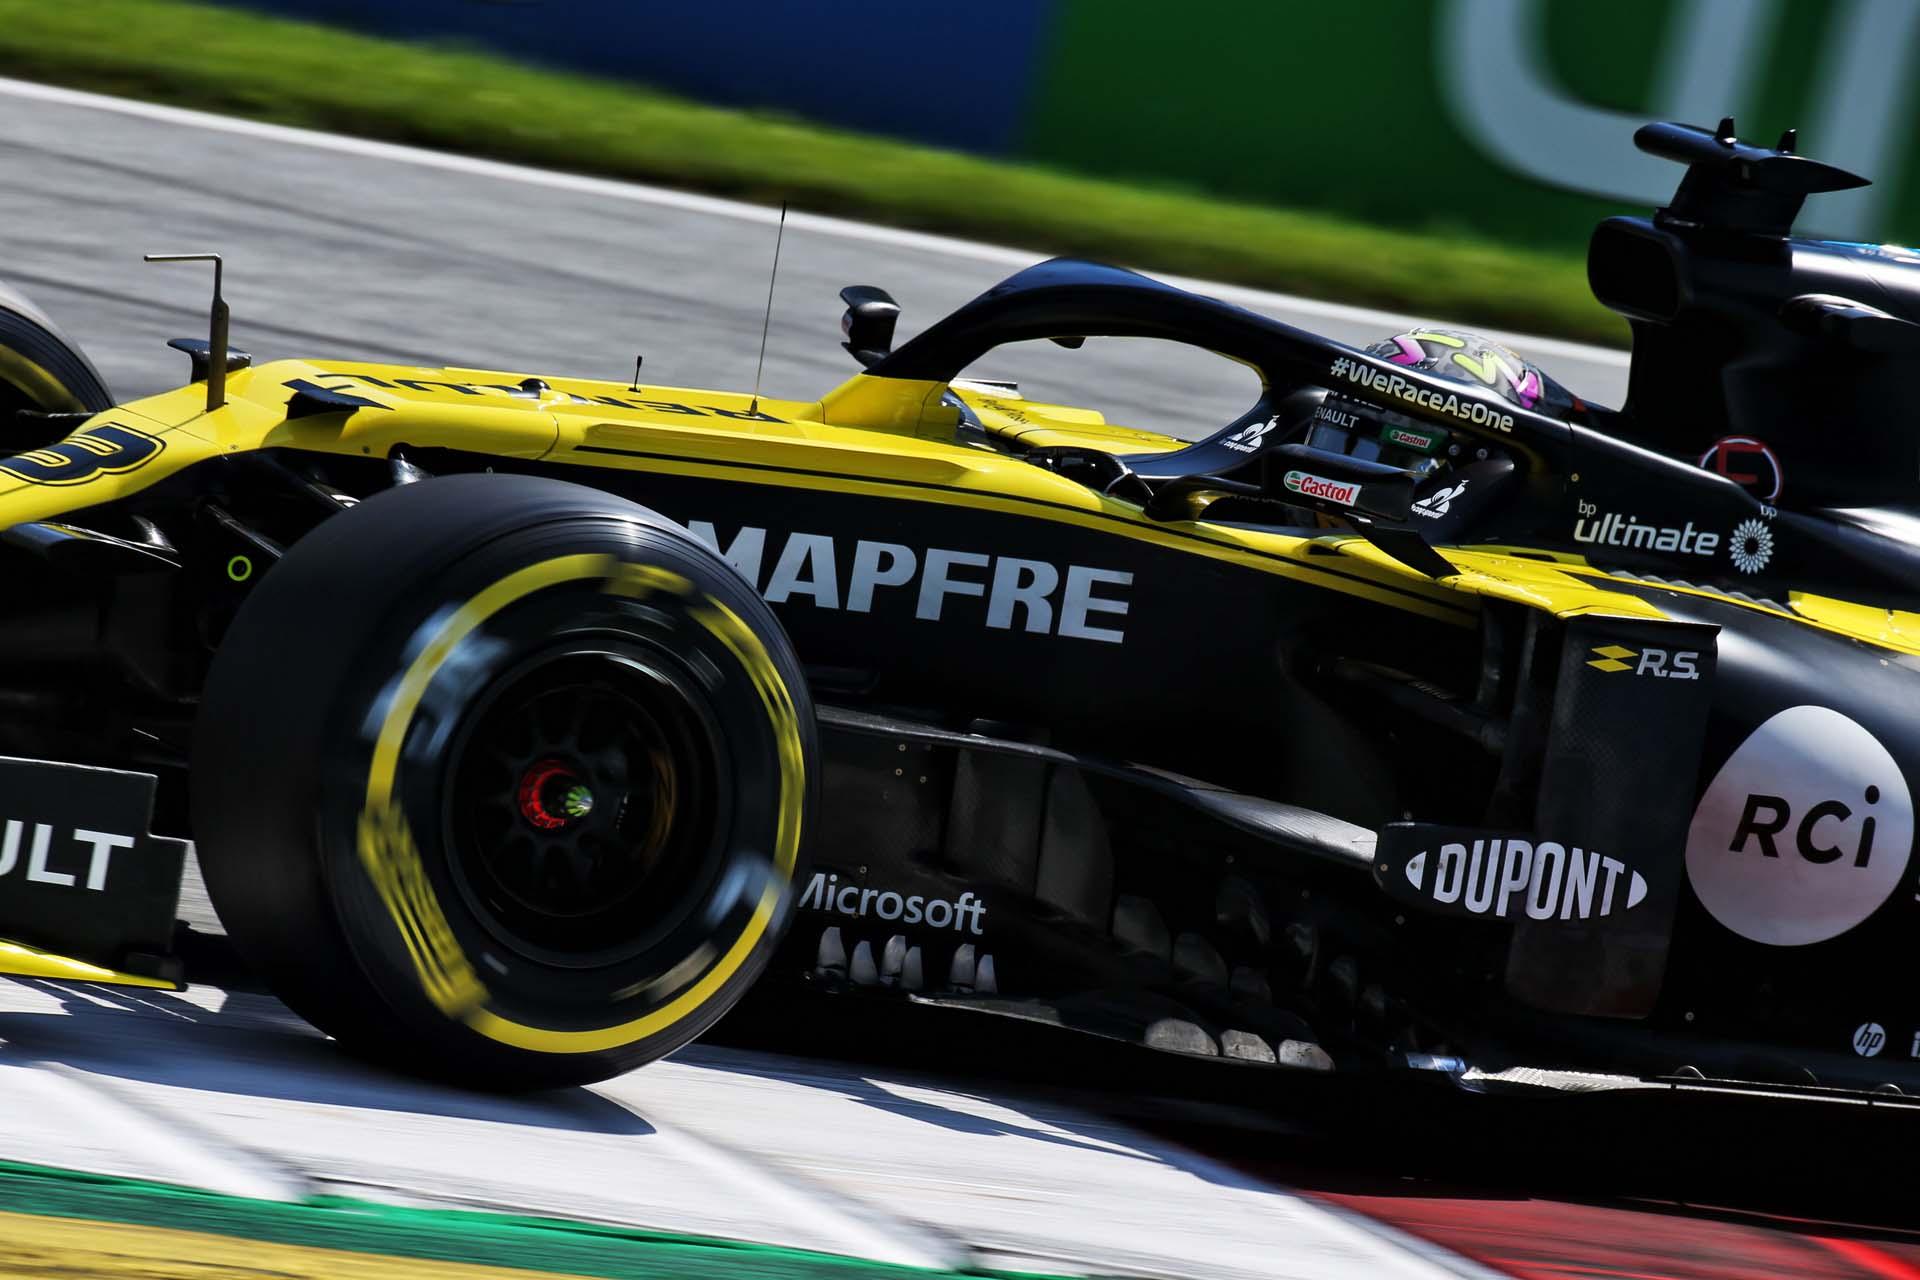 Motor Racing - Formula One World Championship - Steiermark Grand Prix - Practice Day - Spielberg, Austria